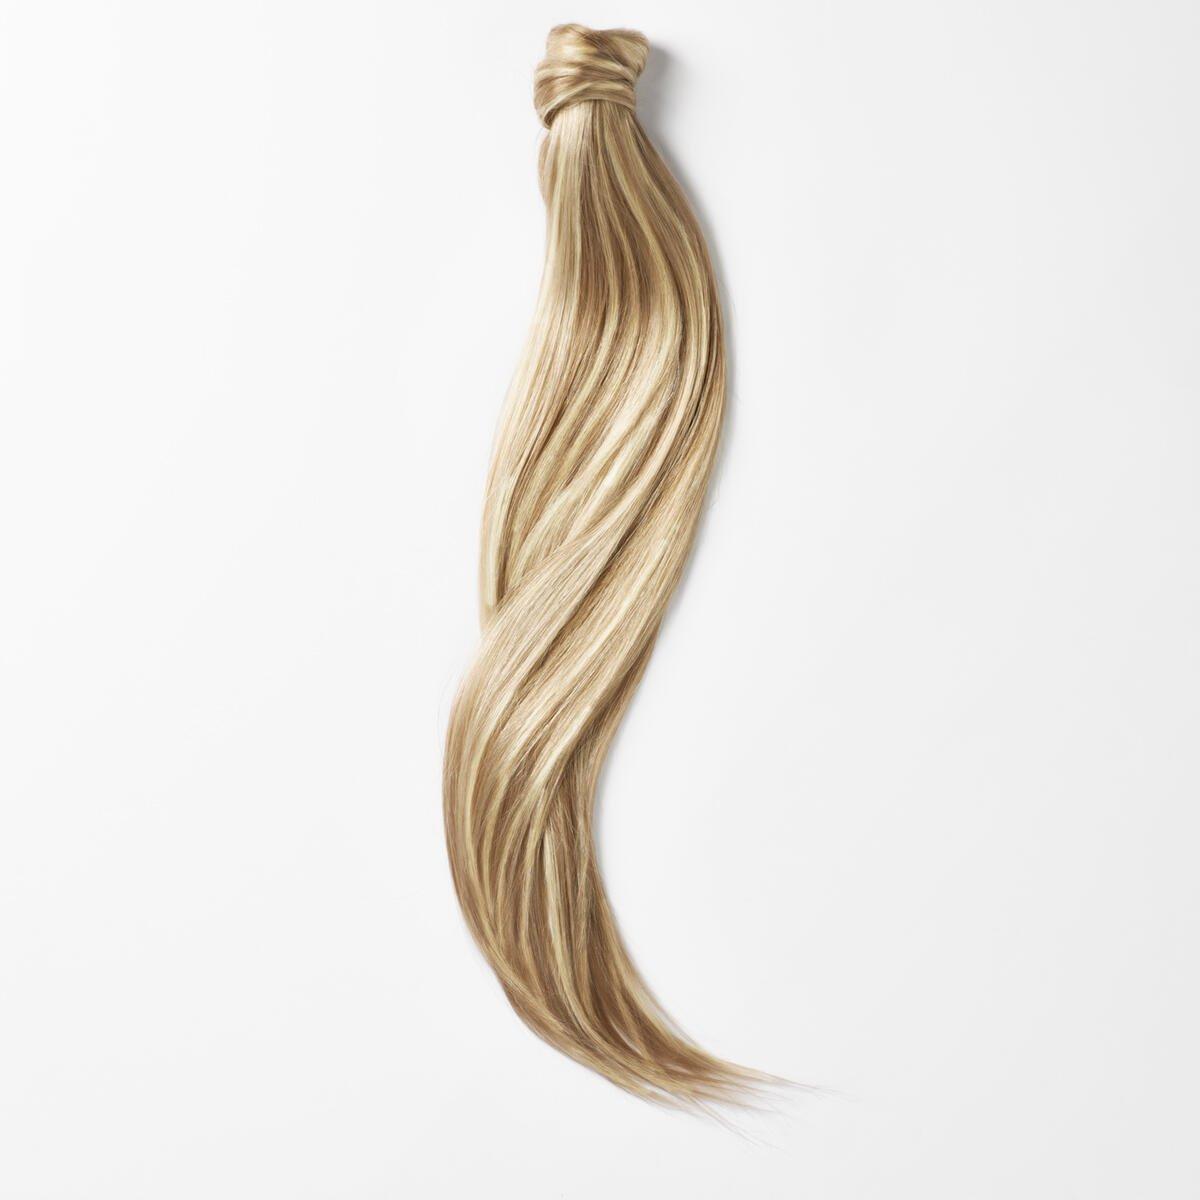 Sleek Clip-in Ponytail M7.3/10.8 Cendre Ash Blonde Mix 50 cm